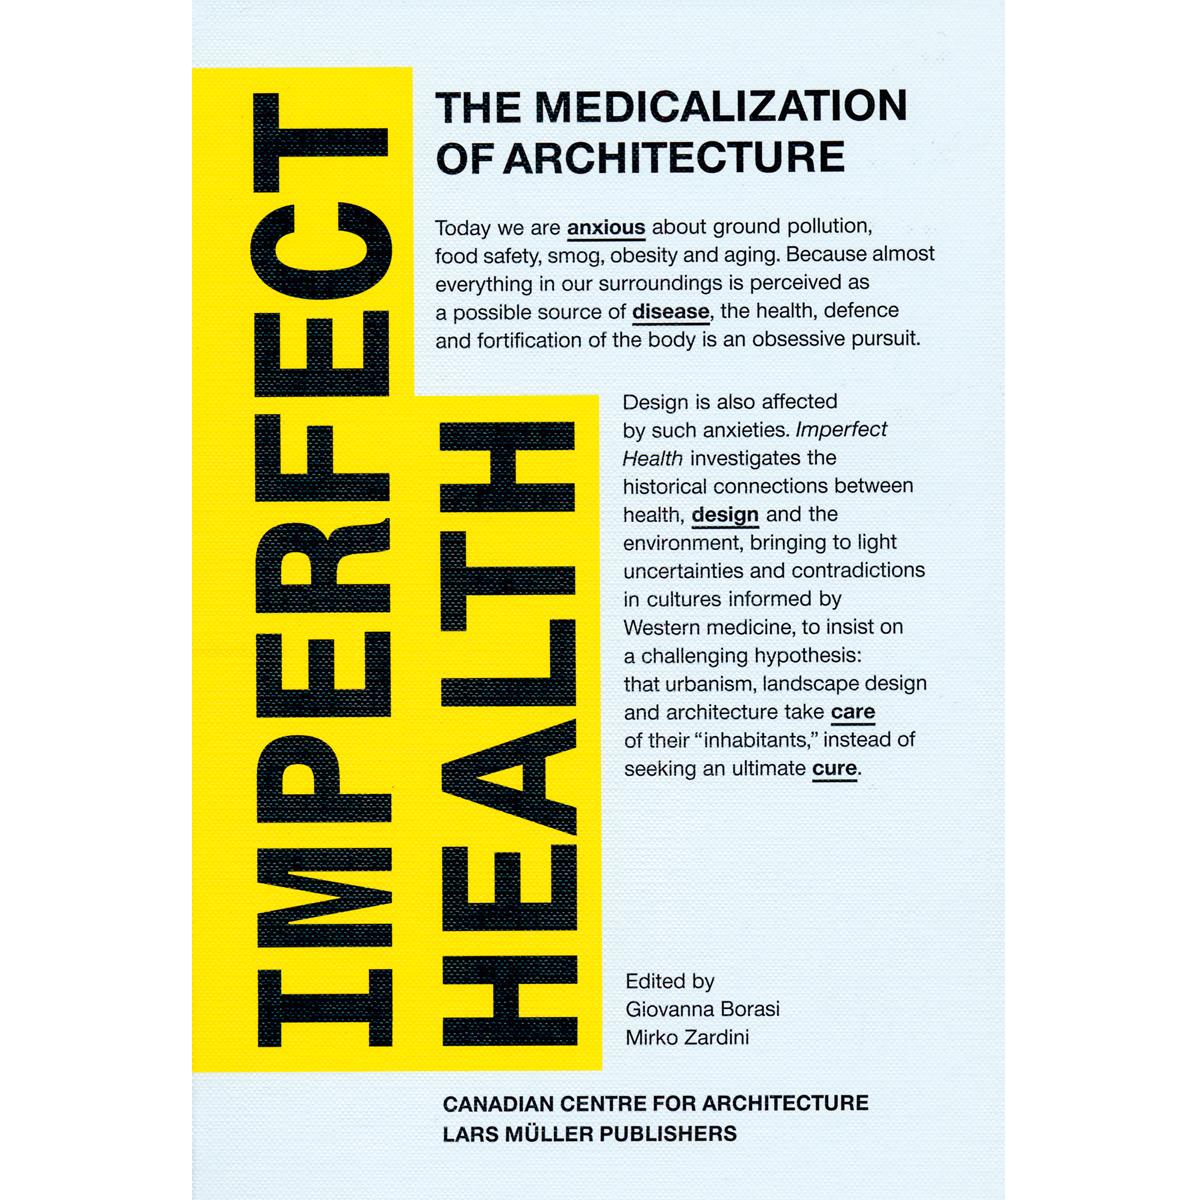 Imperfect Health